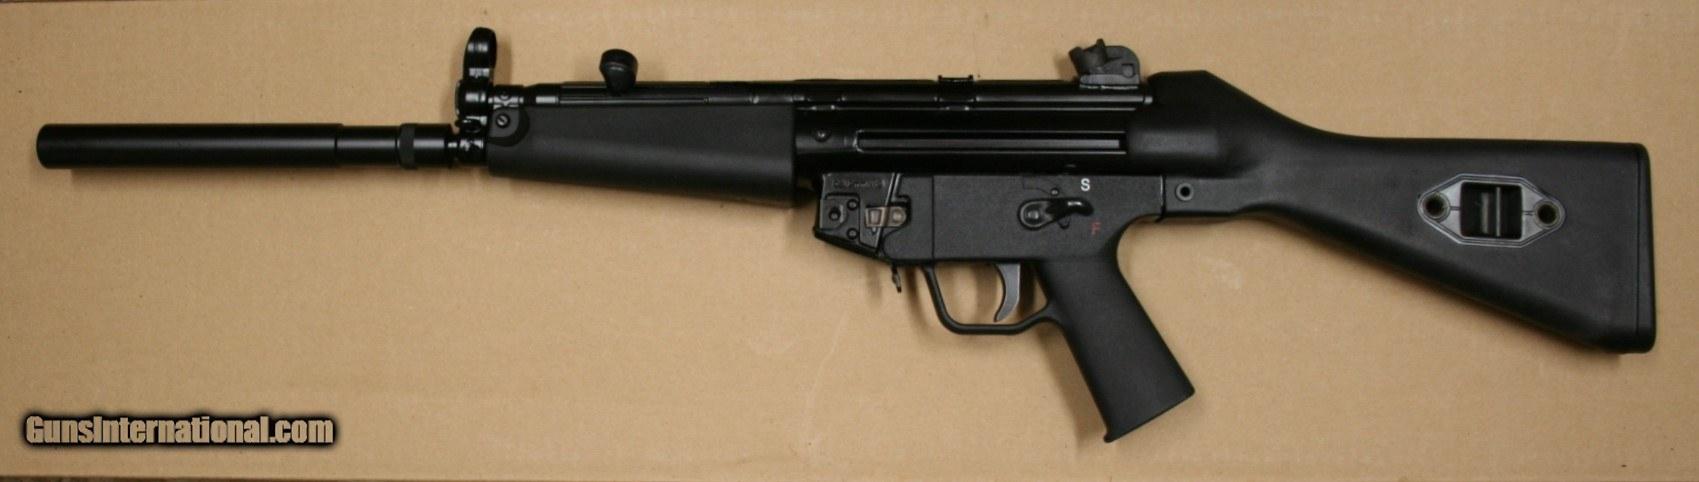 Coharie Arms CA94FS Semi-Auto 9mm 16 5